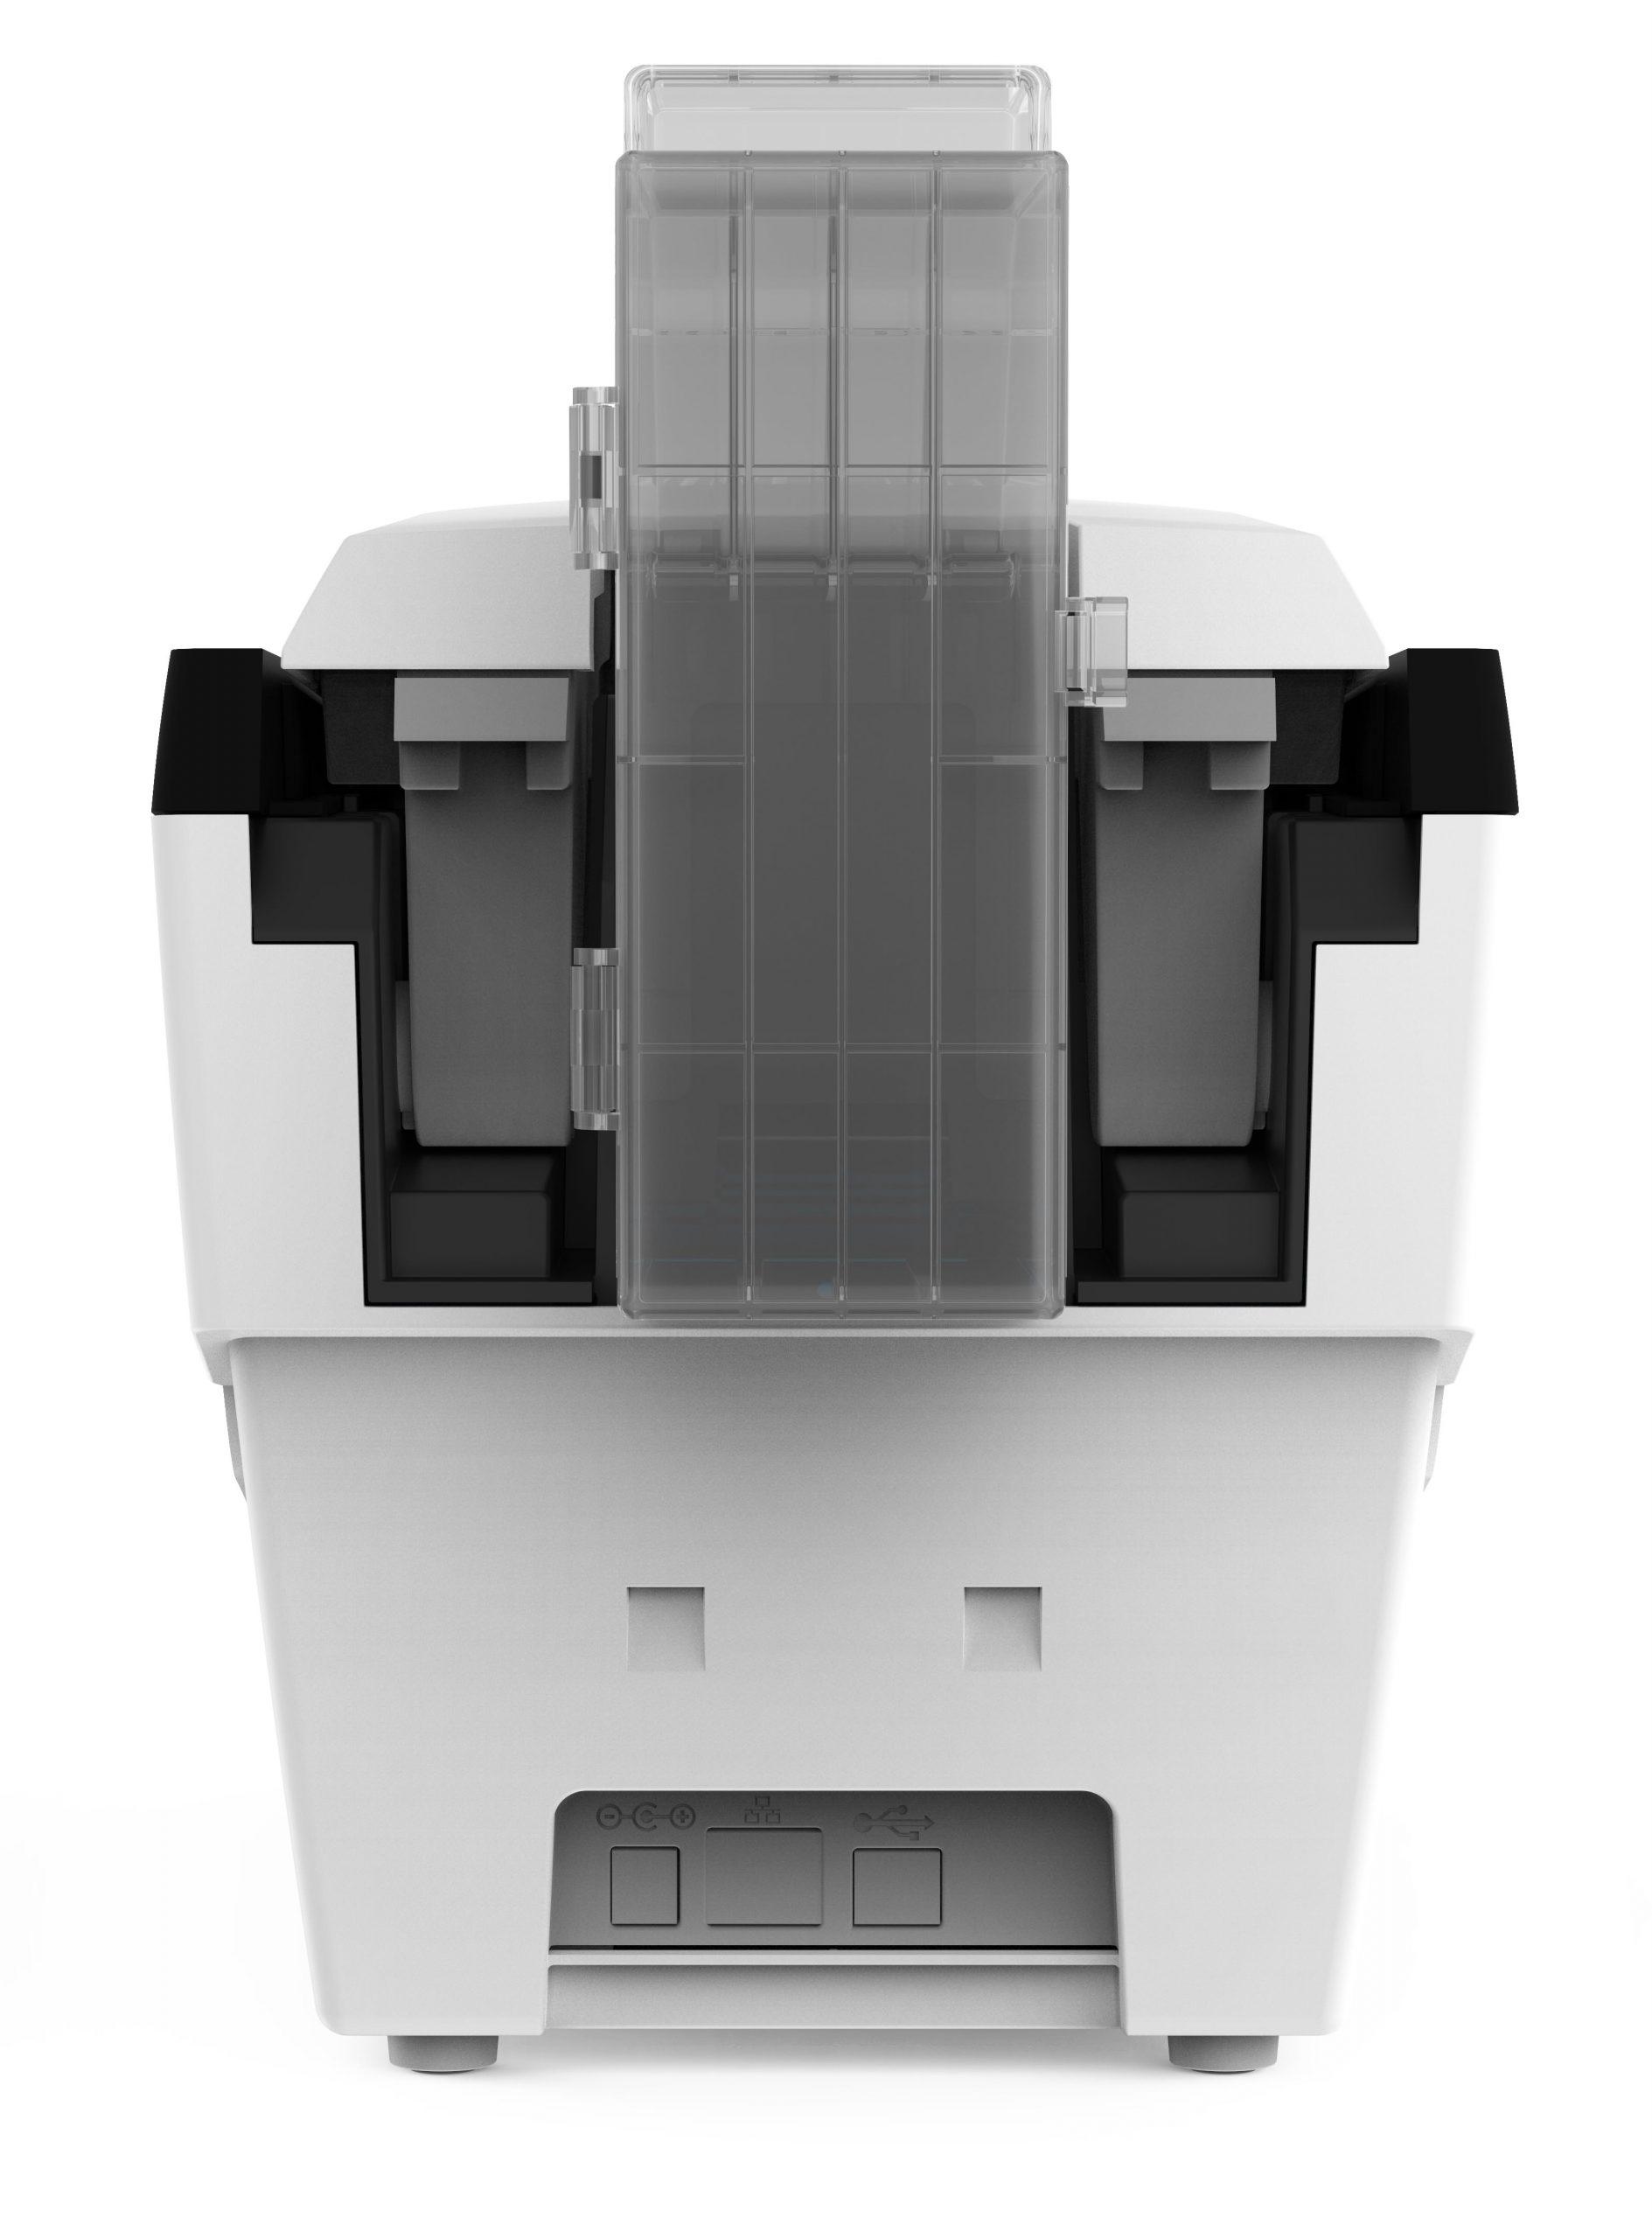 Magicard Rio Pro 360 Single Sided Card Printer 3652-0001